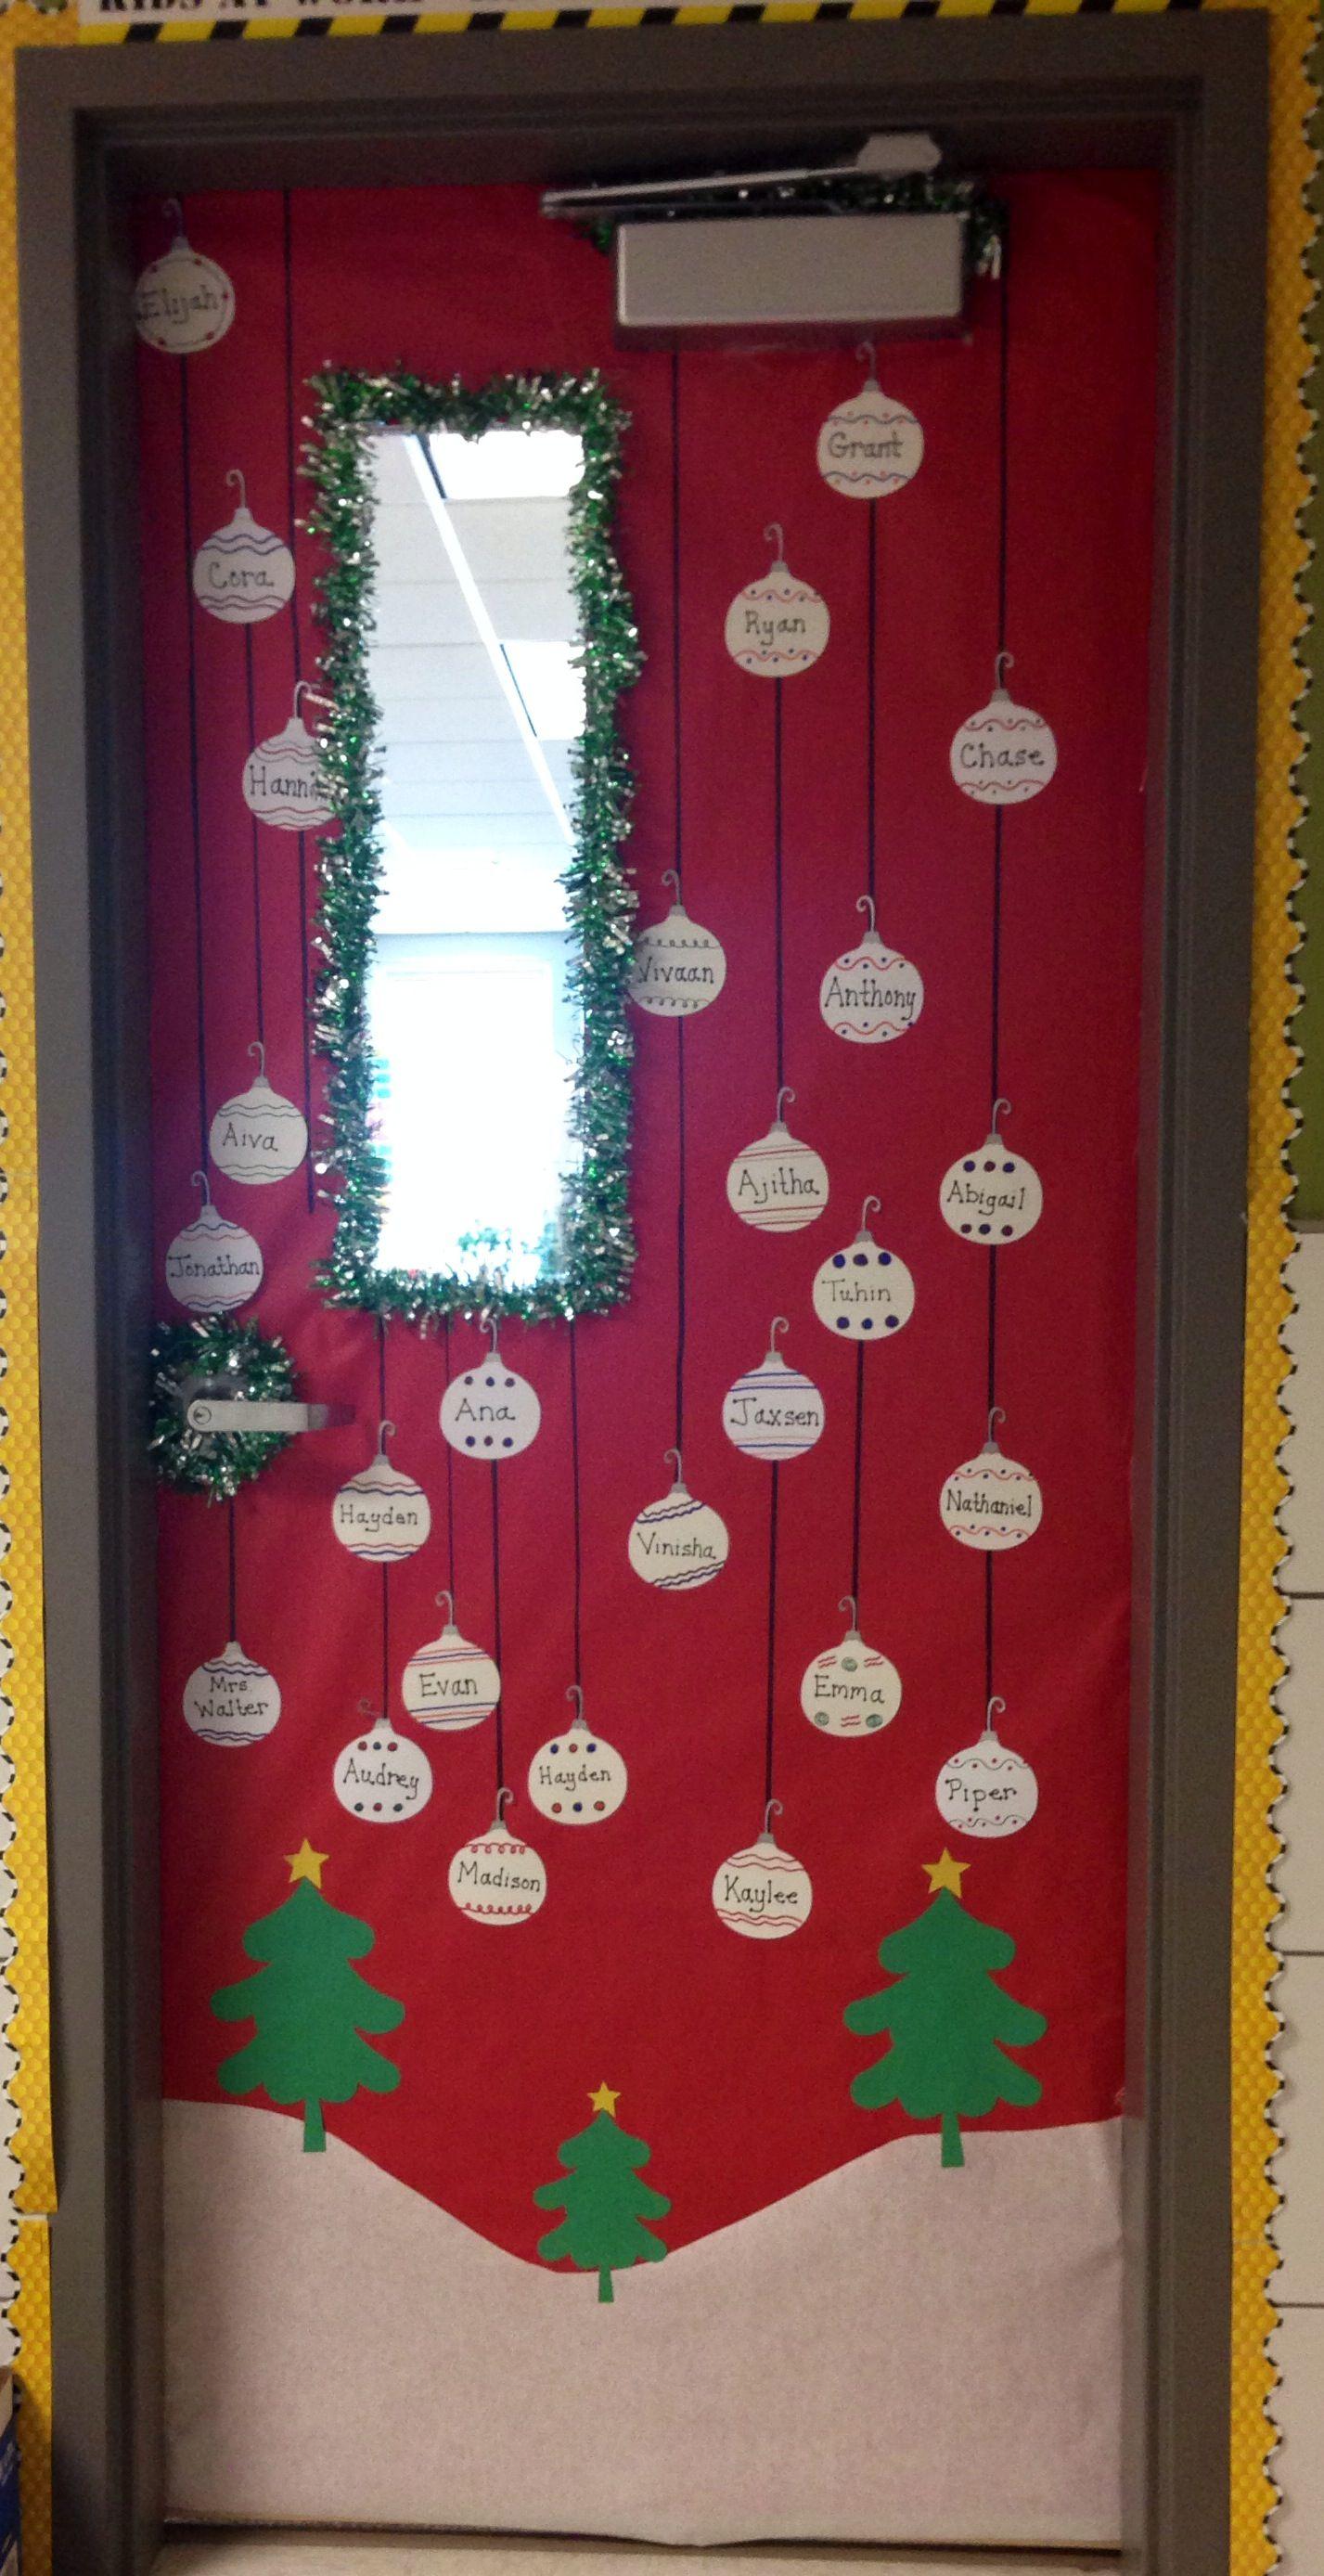 Winter Holiday Classroom Door Decorations : Classroom door decorations for winter